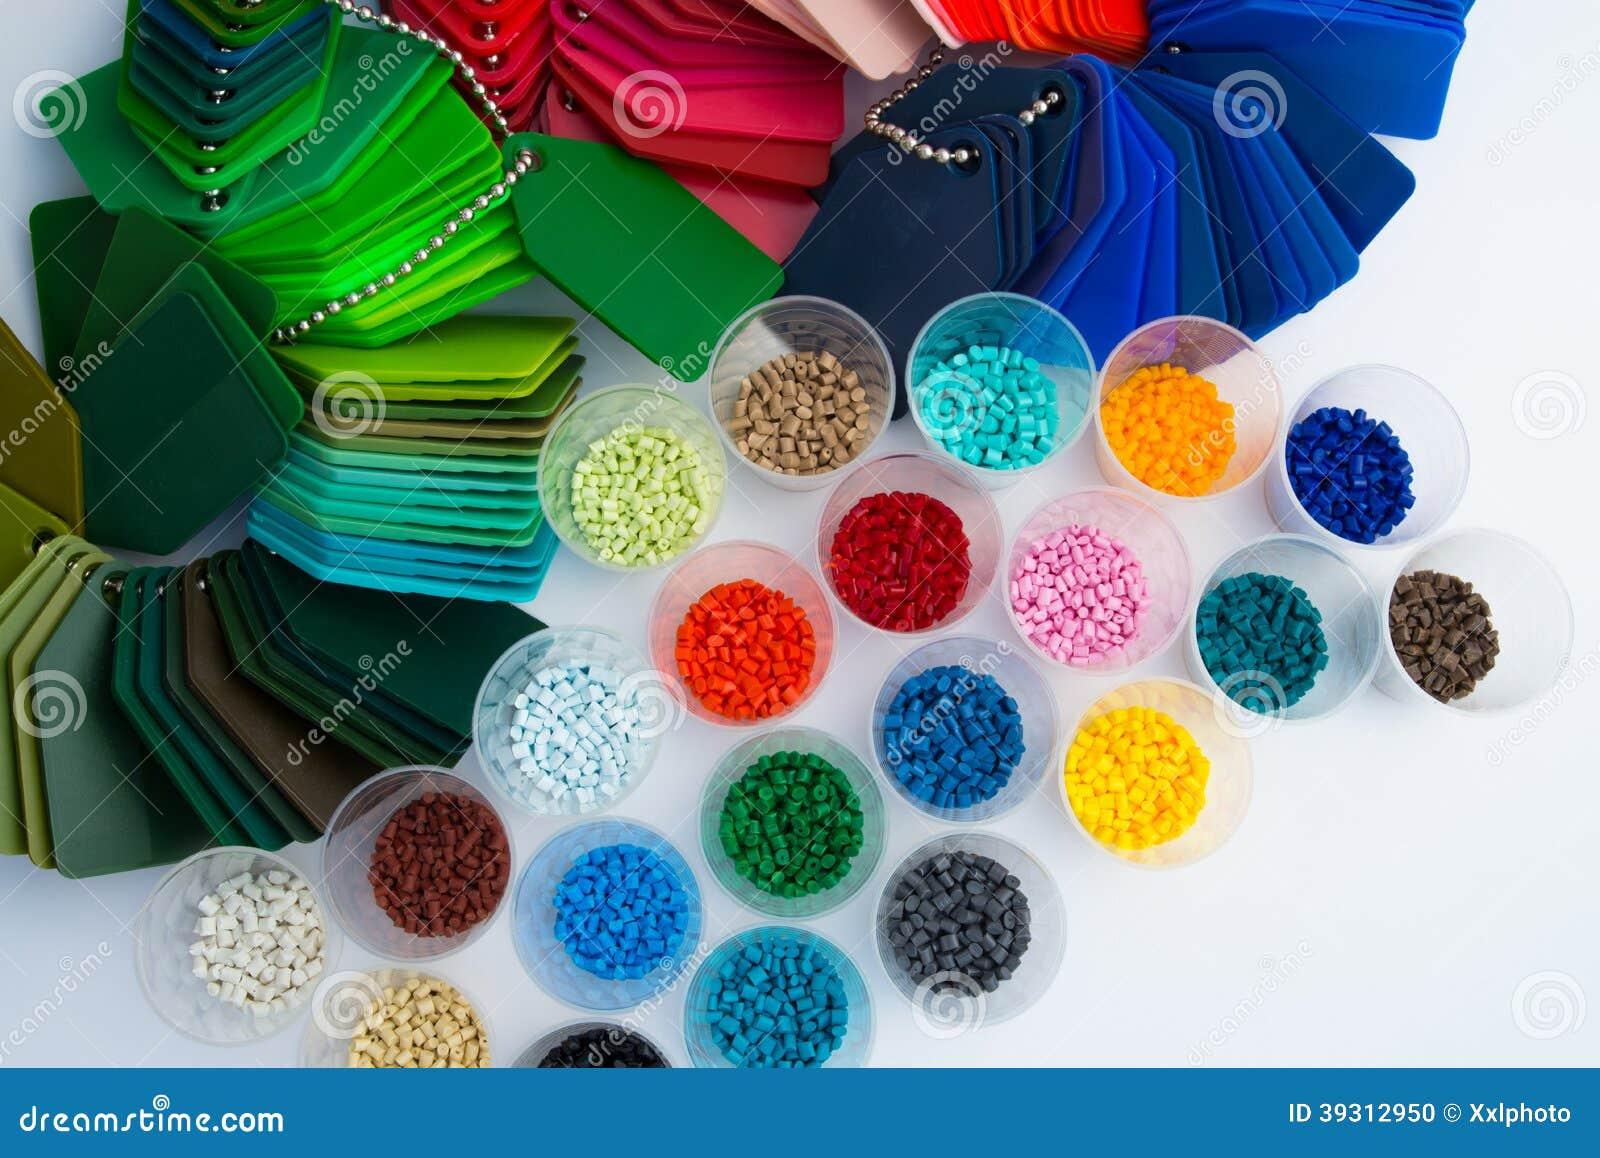 Plastikowy polimer granuluje